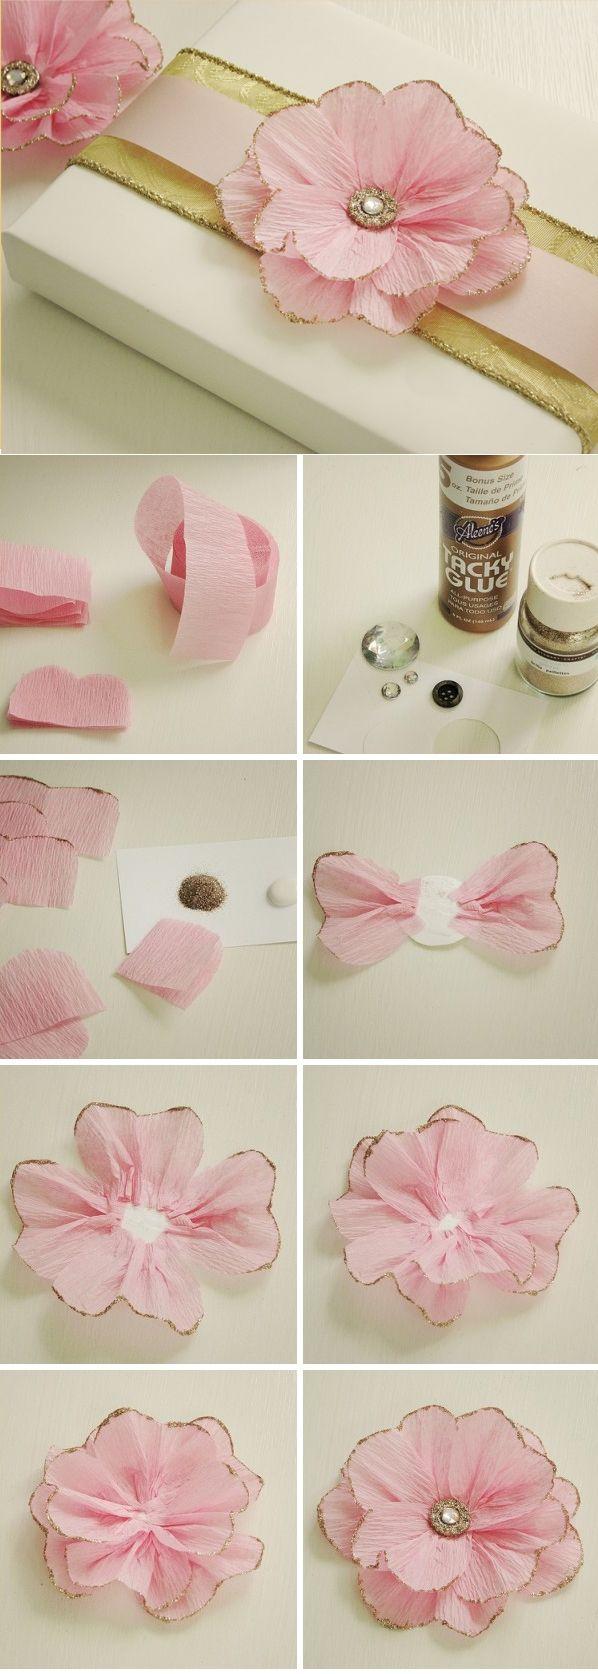 Blumen zum Muttertag basteln – 26 Ideen aus Seidenpapier